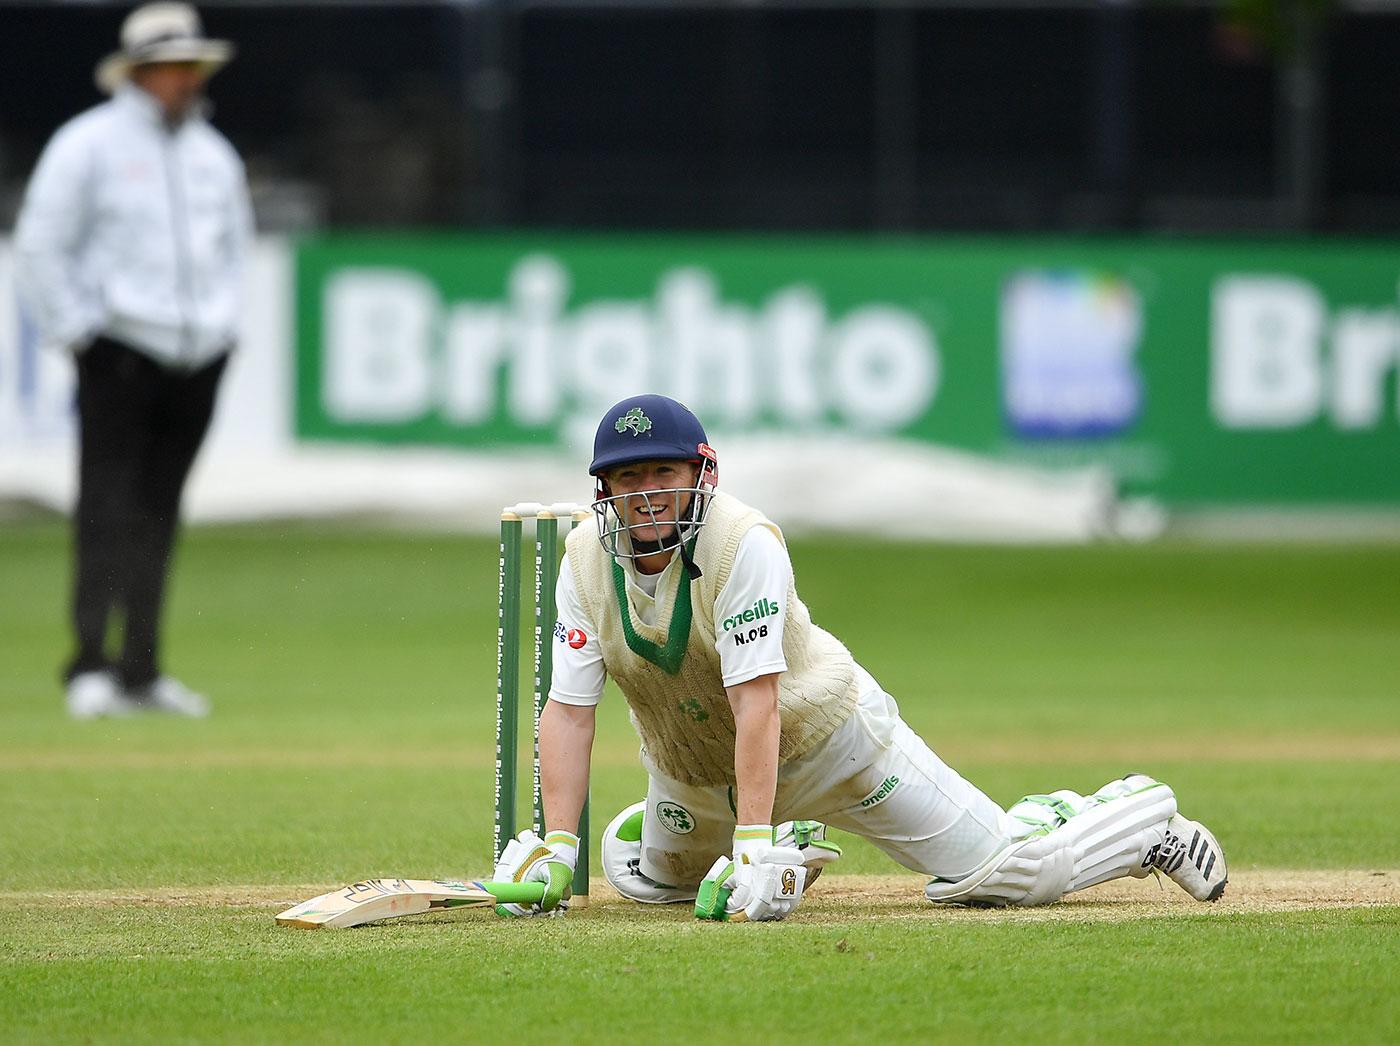 Niall O'Brien Retires From International Cricket 1